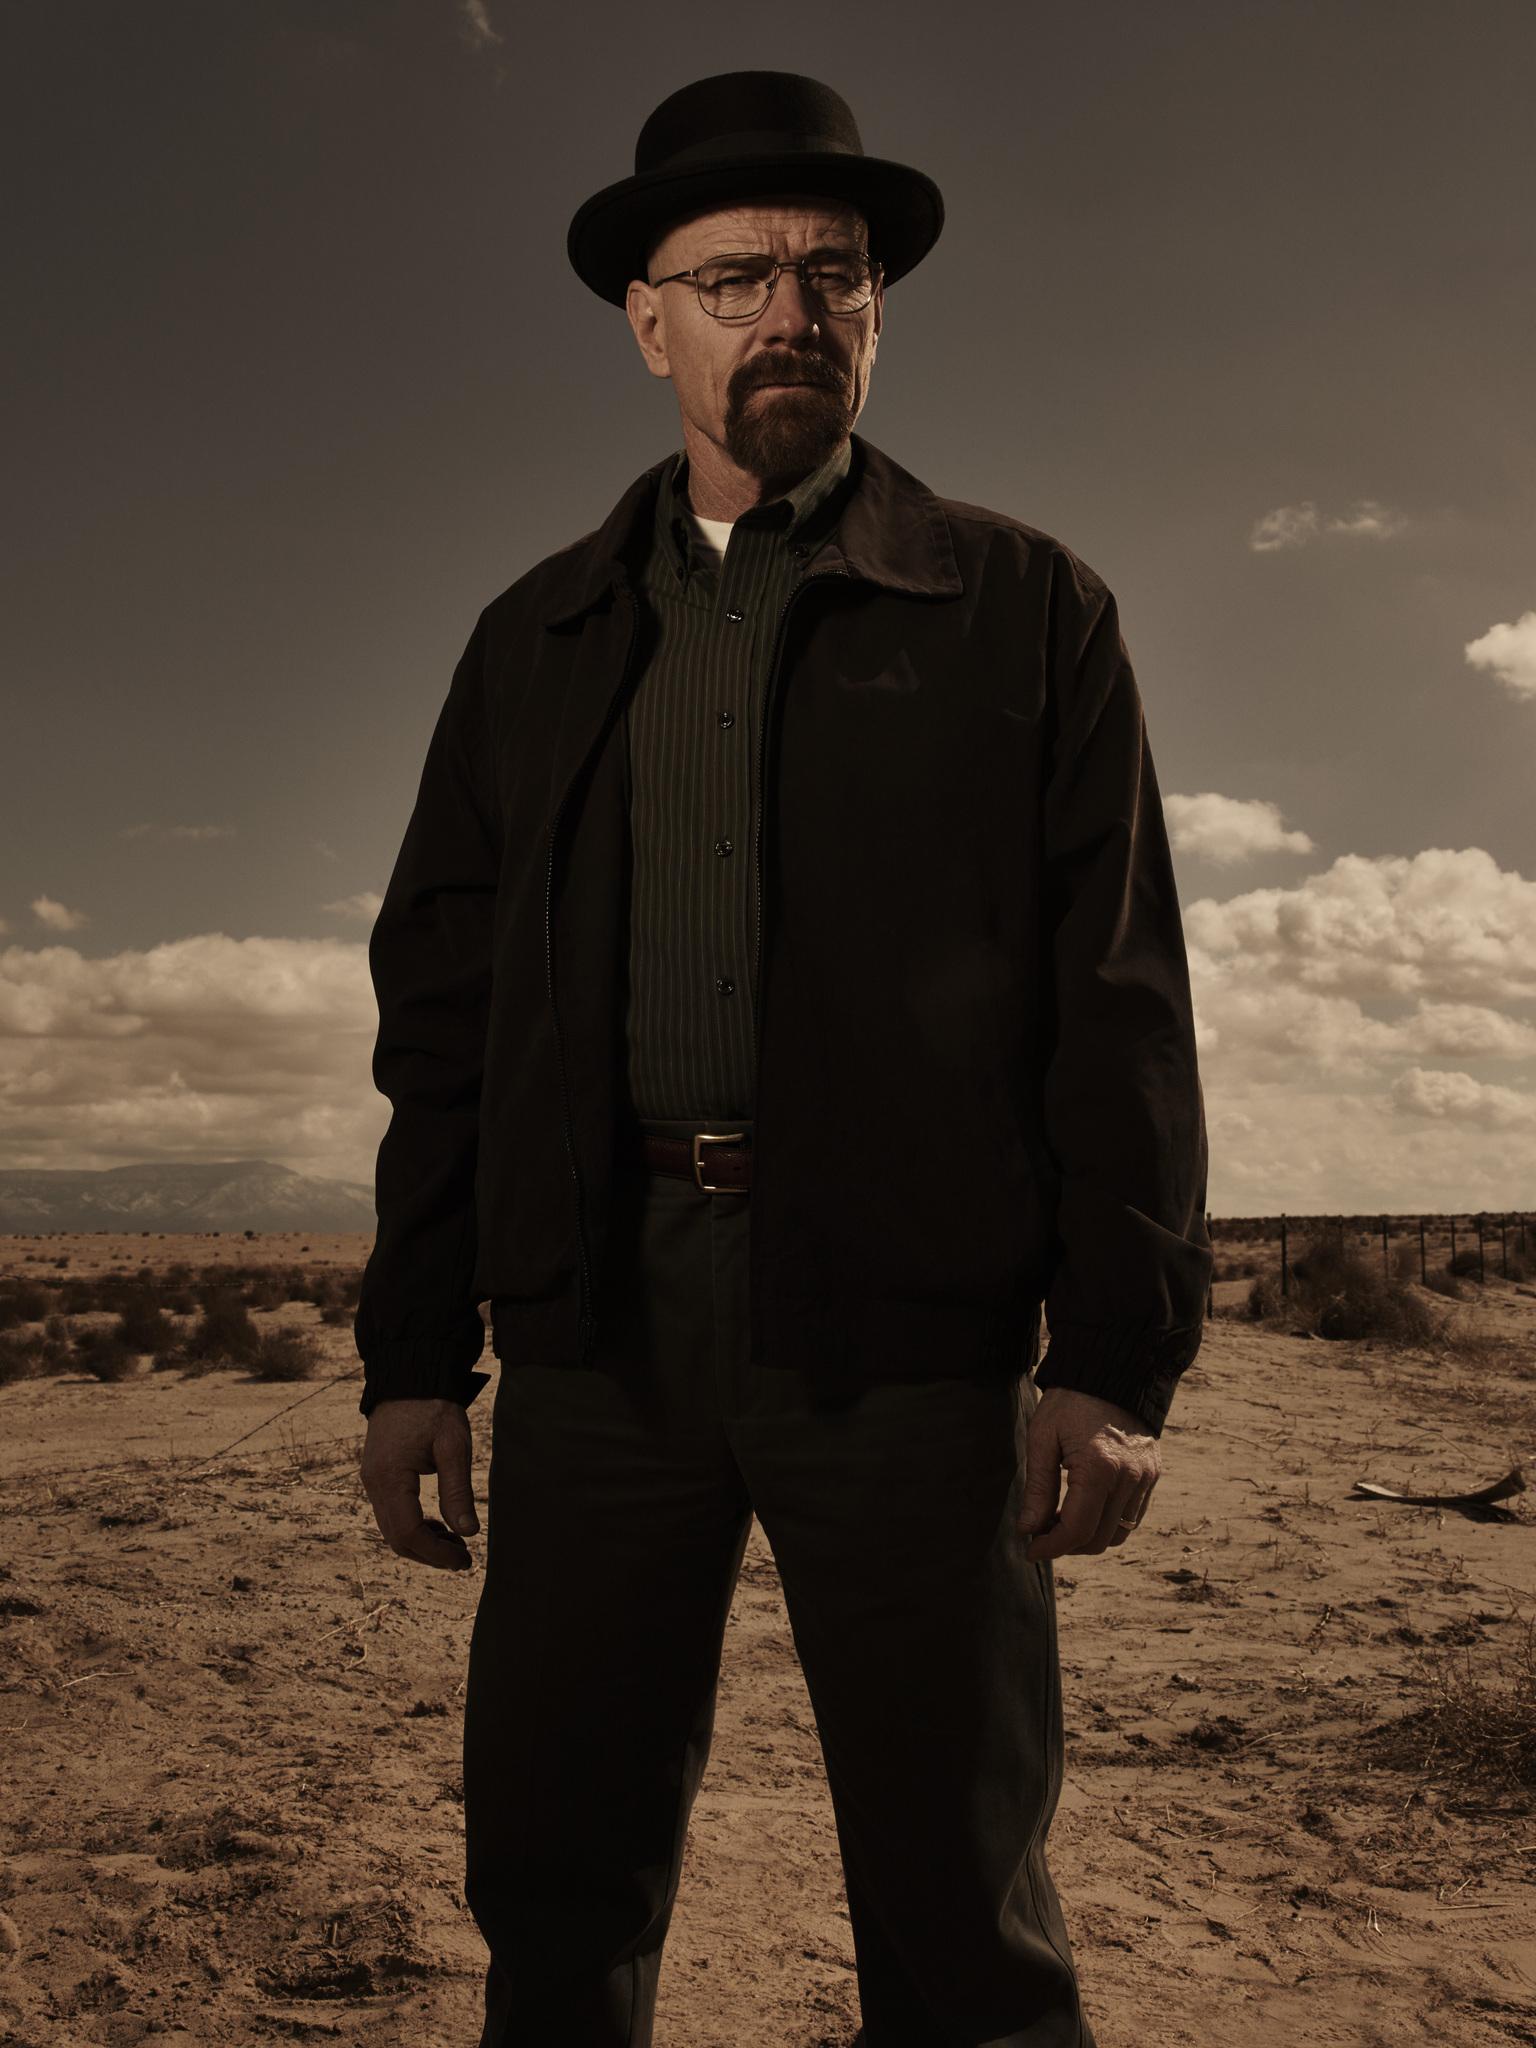 Bryan Cranston in Breaking Bad (2008)